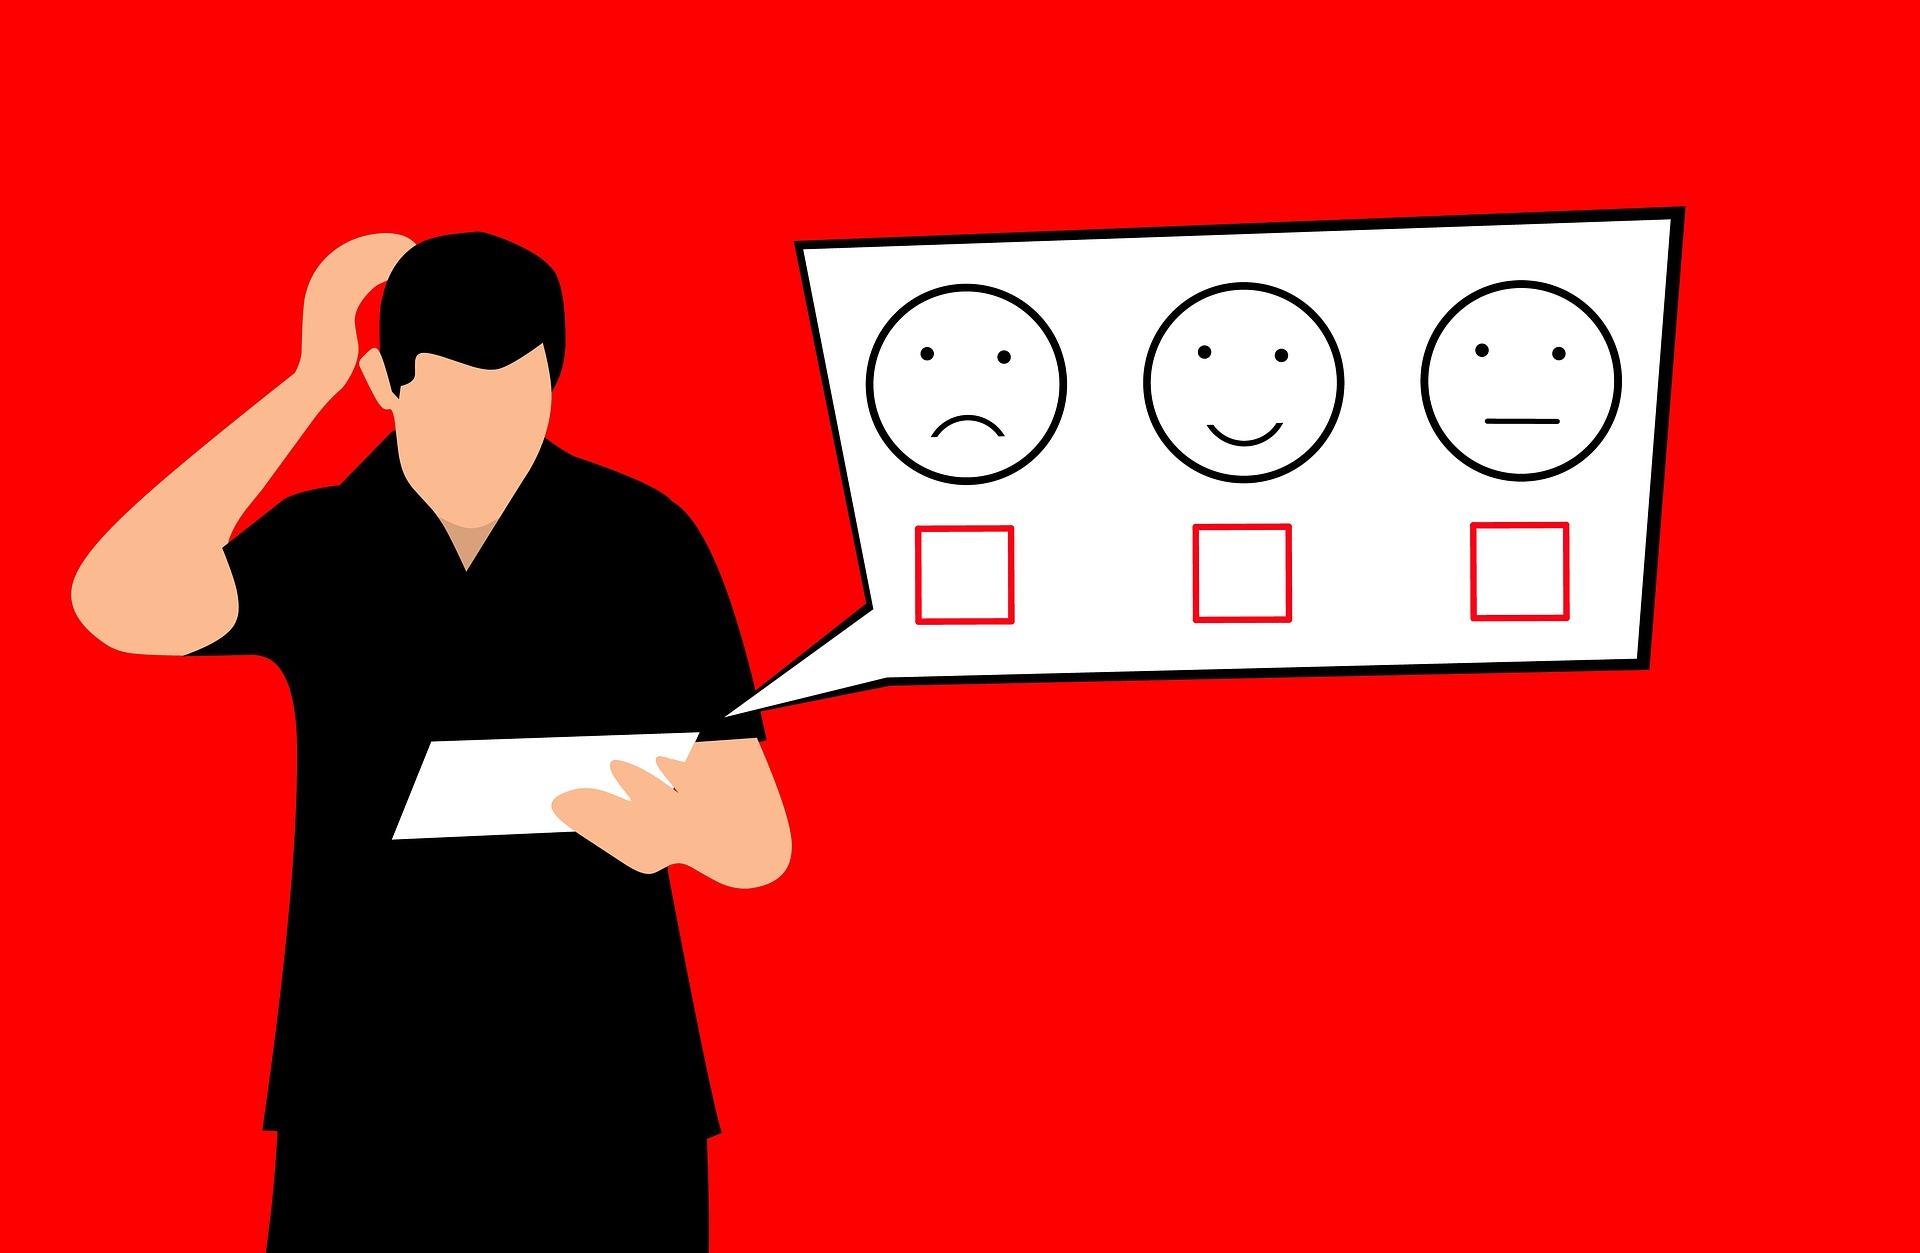 Review of shopbarebeaute.com - Read Customer Service Reviews